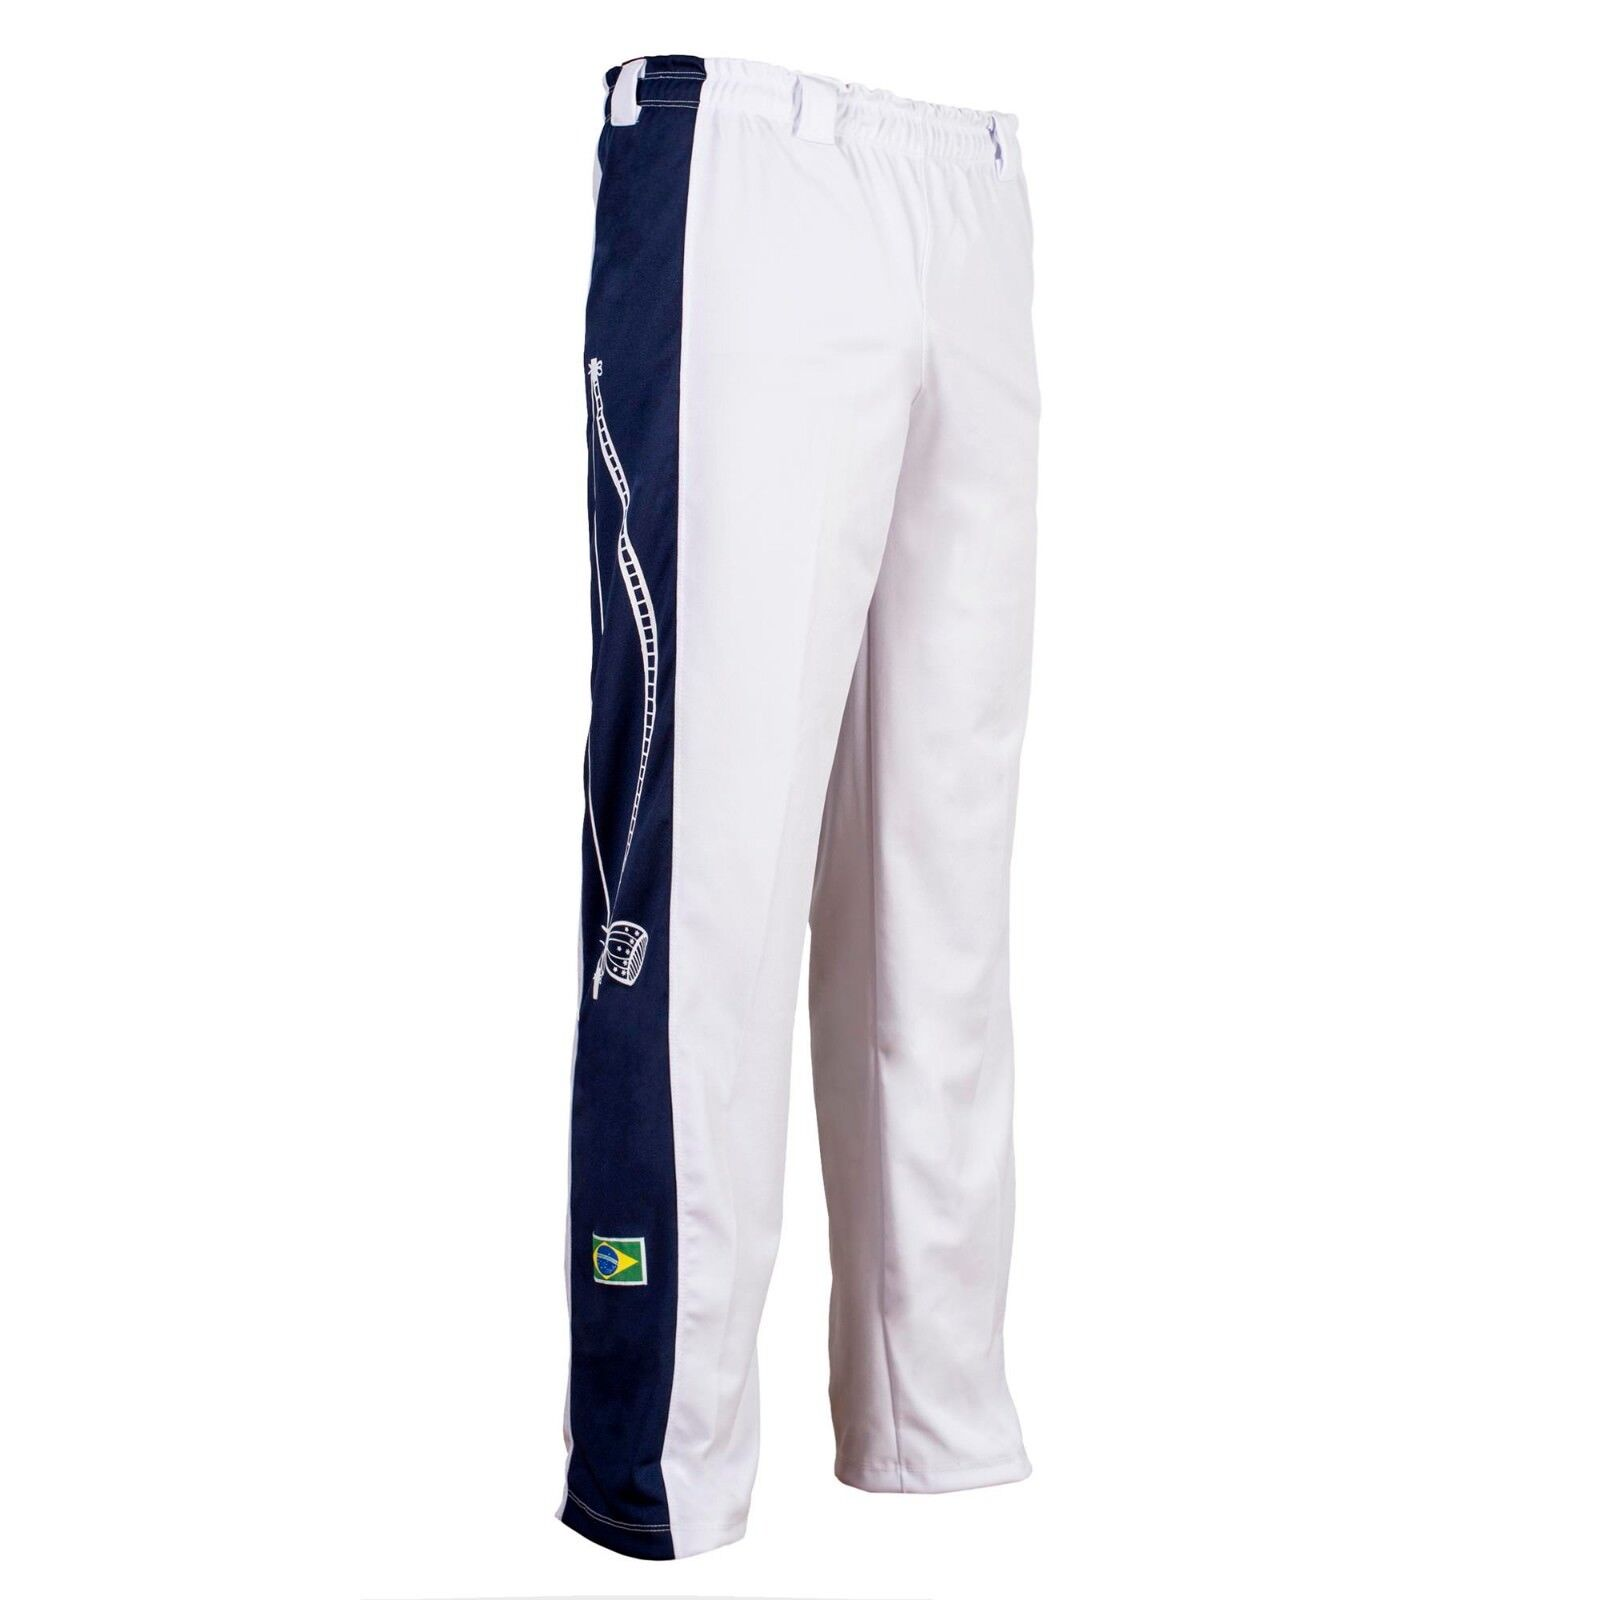 White Berimbau Brazil Traditional Capoeira Abada Elastic Trousers Pants 6 Sizes